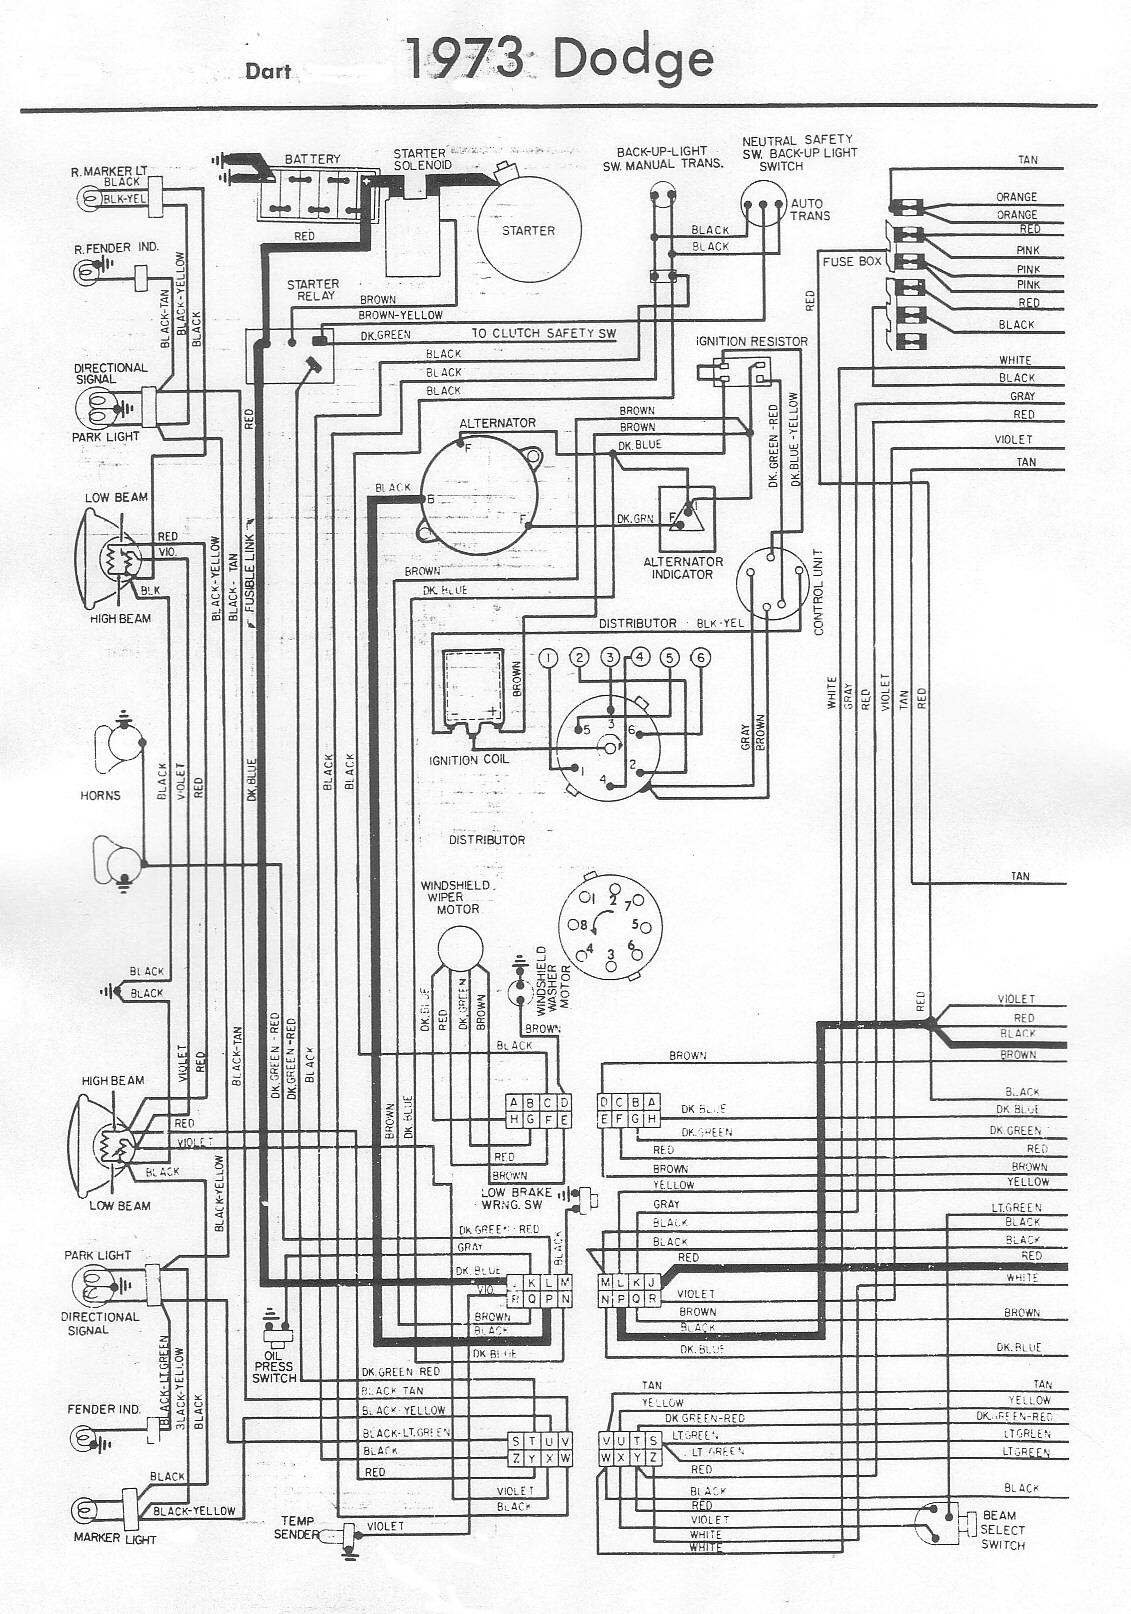 hight resolution of 73 dodge dart wiring diagram wiring diagrams data 1973 dodge dart engine wiring harness 1973 dodge dart wiring harness